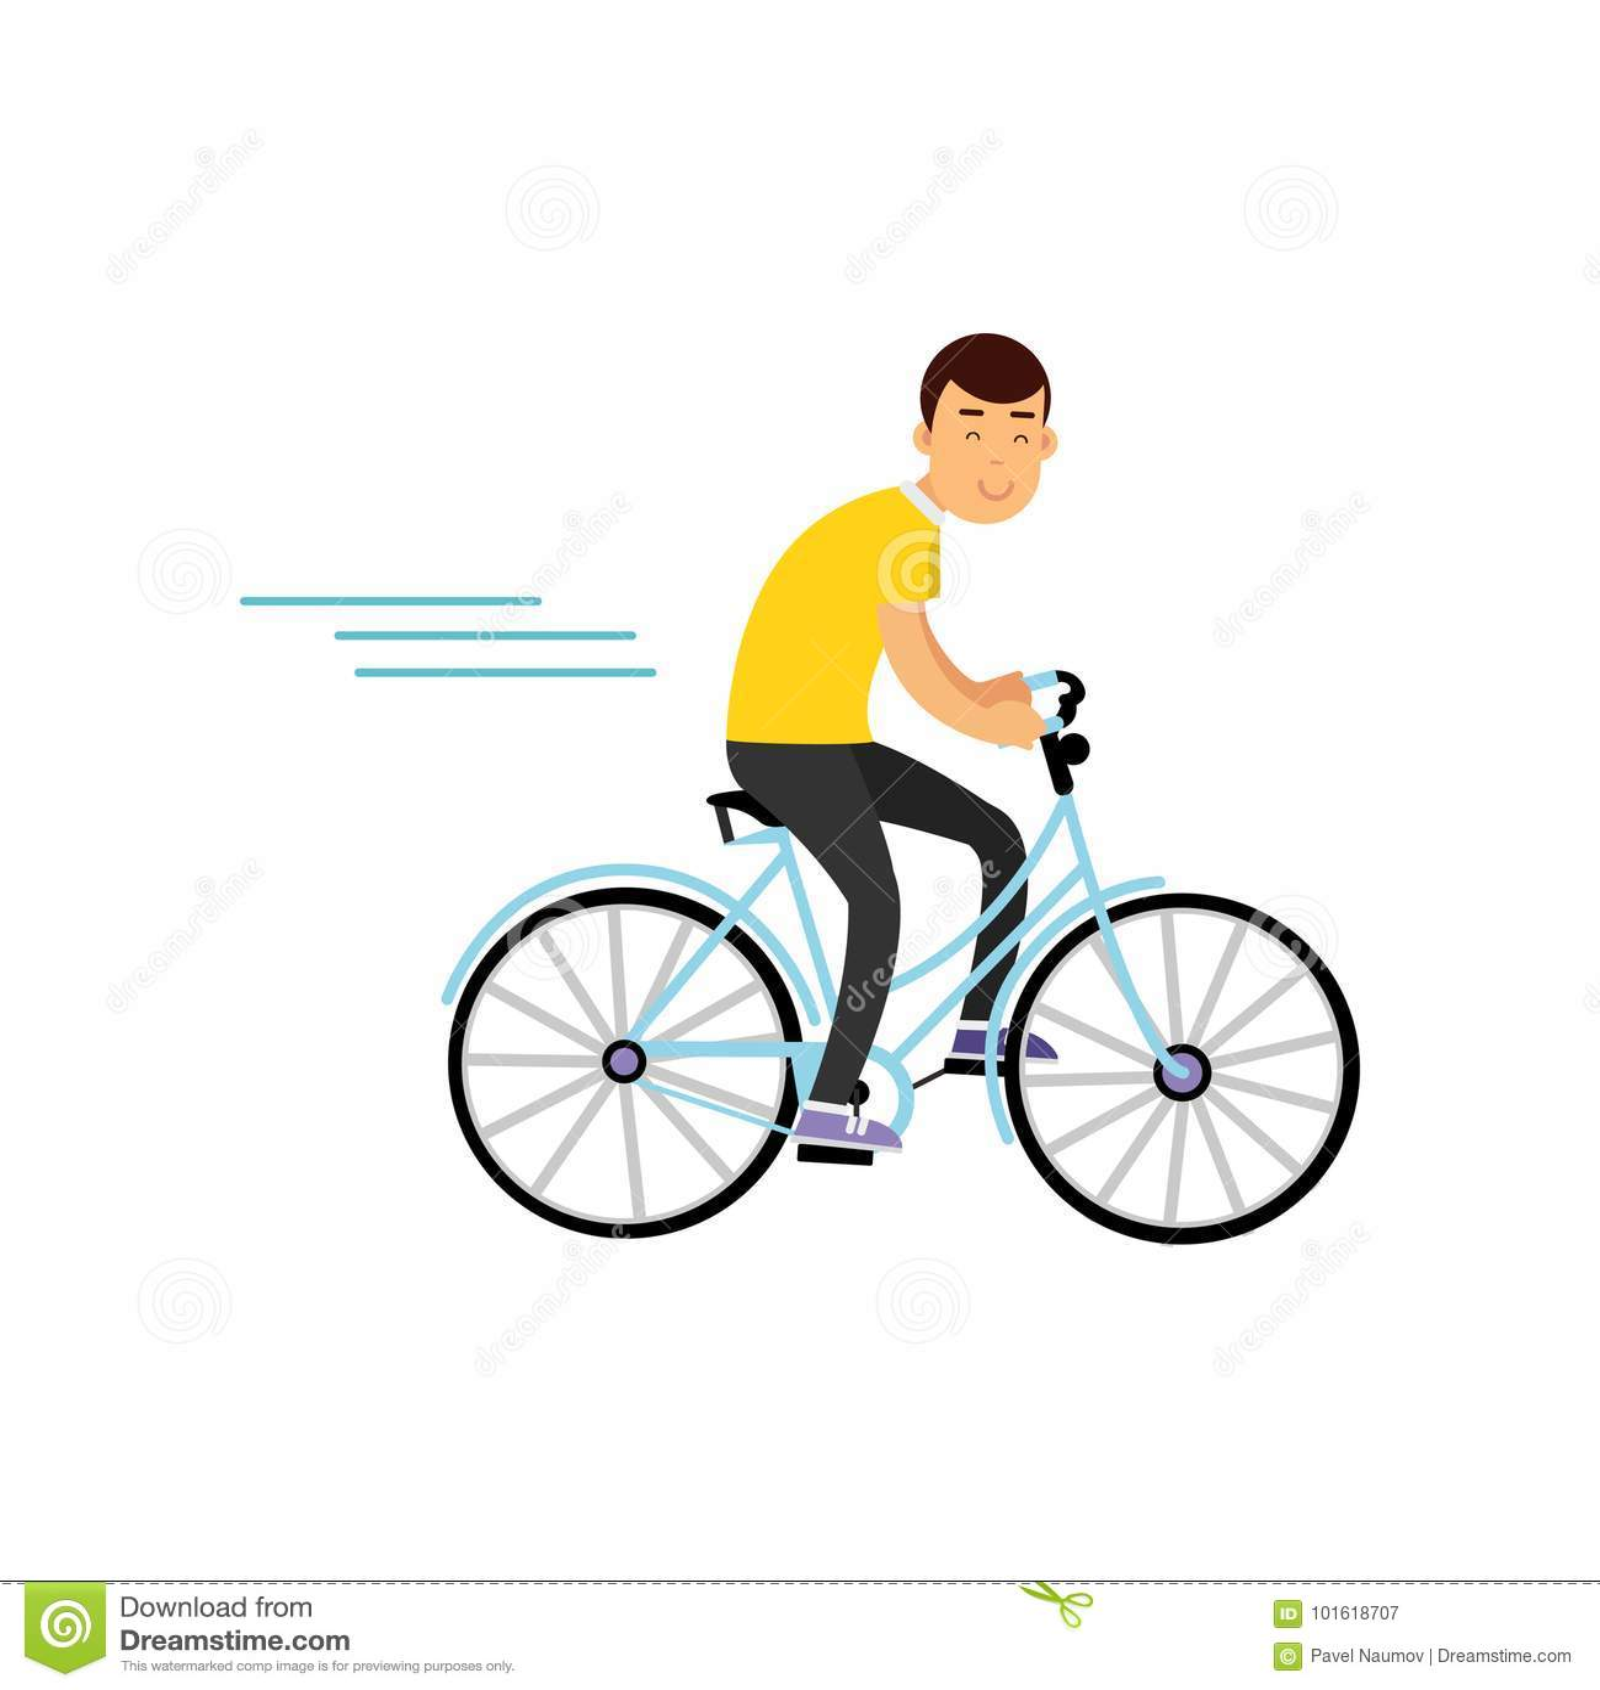 0d1ae0b90a9 Ανακύκλωση αγοριών εφήβων στο ποδήλατο, αγόρι που κάνει τον ...